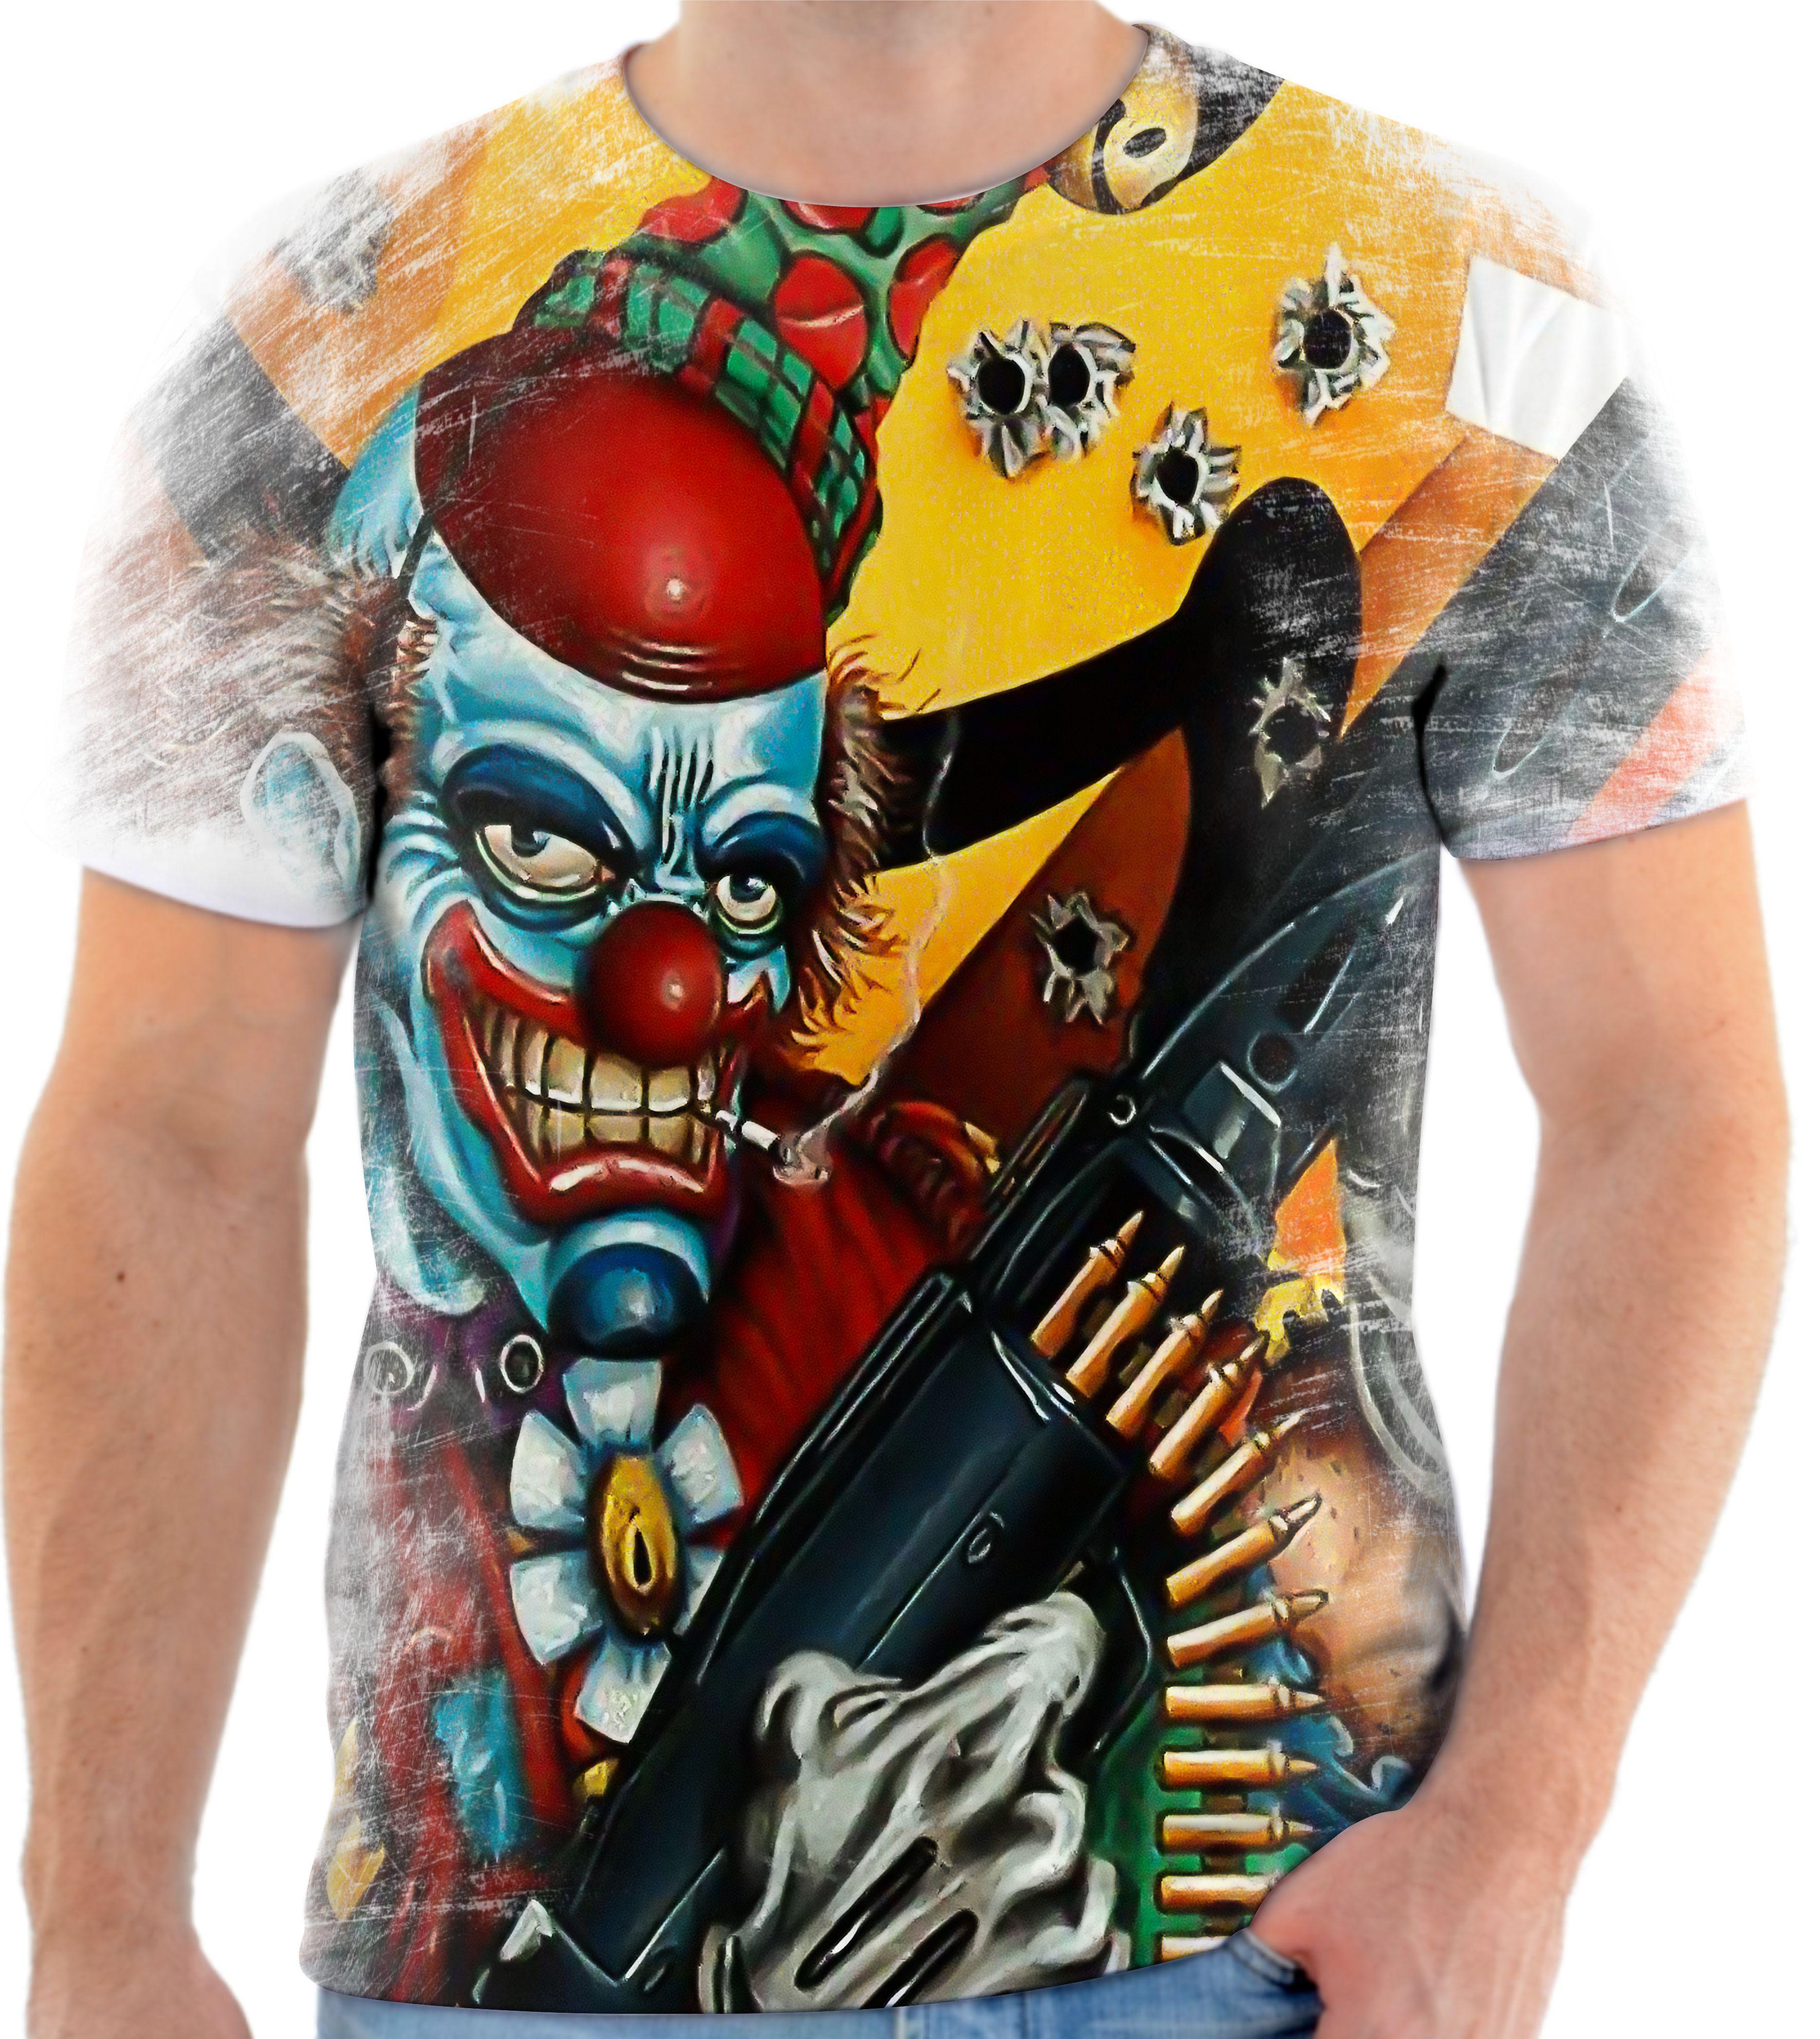 Camisa Camiseta Personaliza Palhaco Assassino 2 No Elo7 Estilo